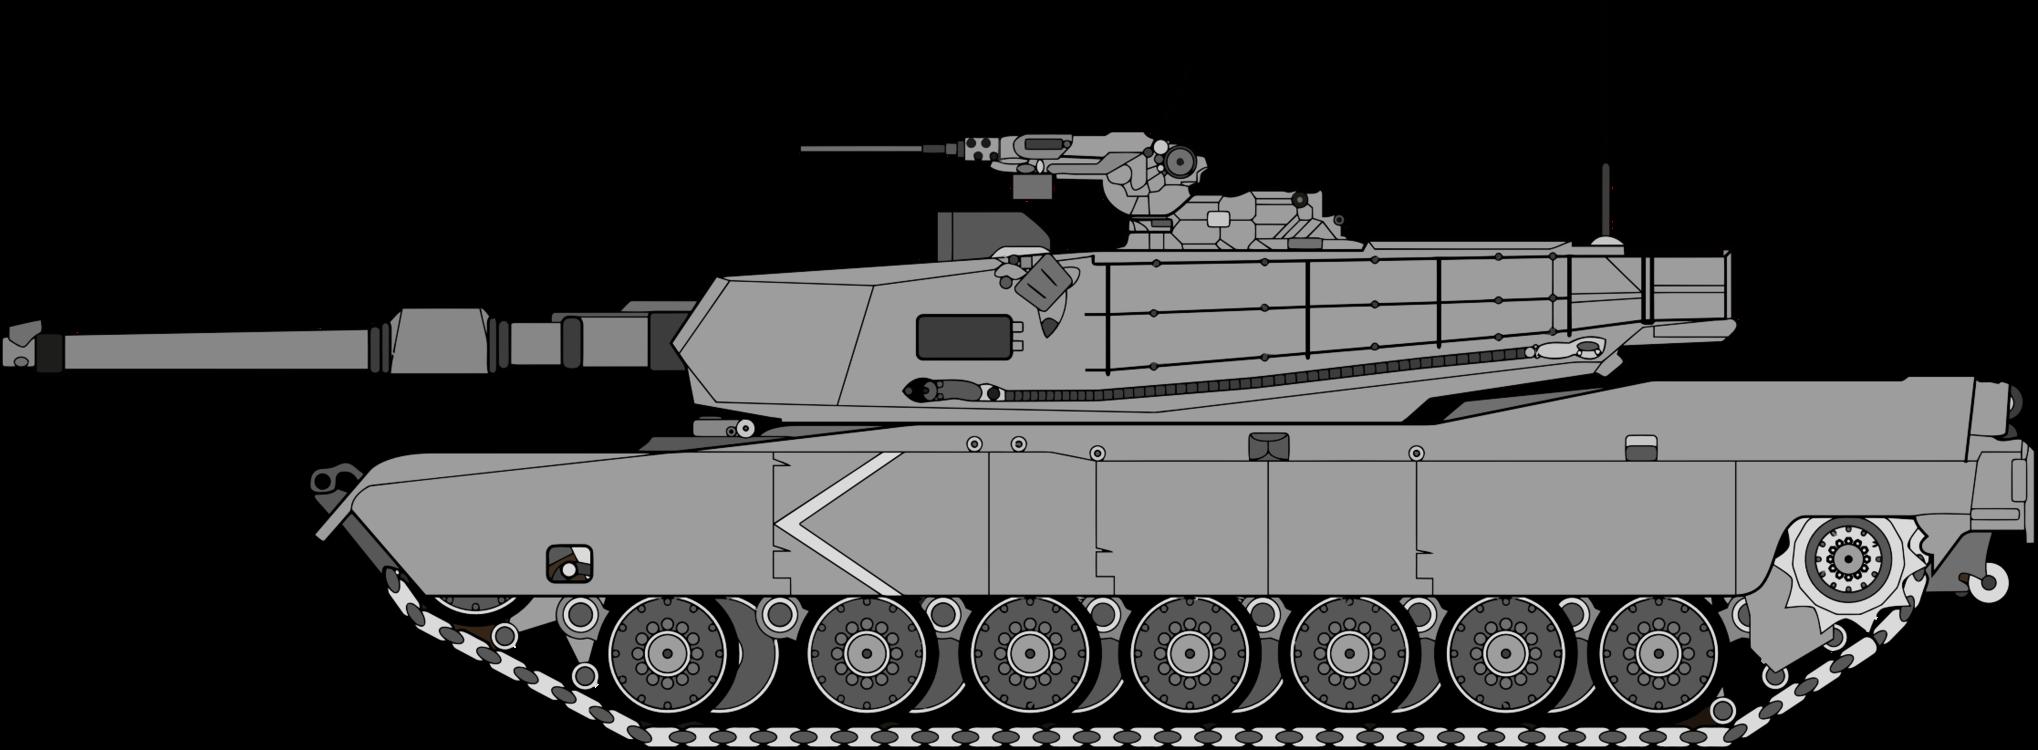 Tank,Churchill Tank,Military Vehicle